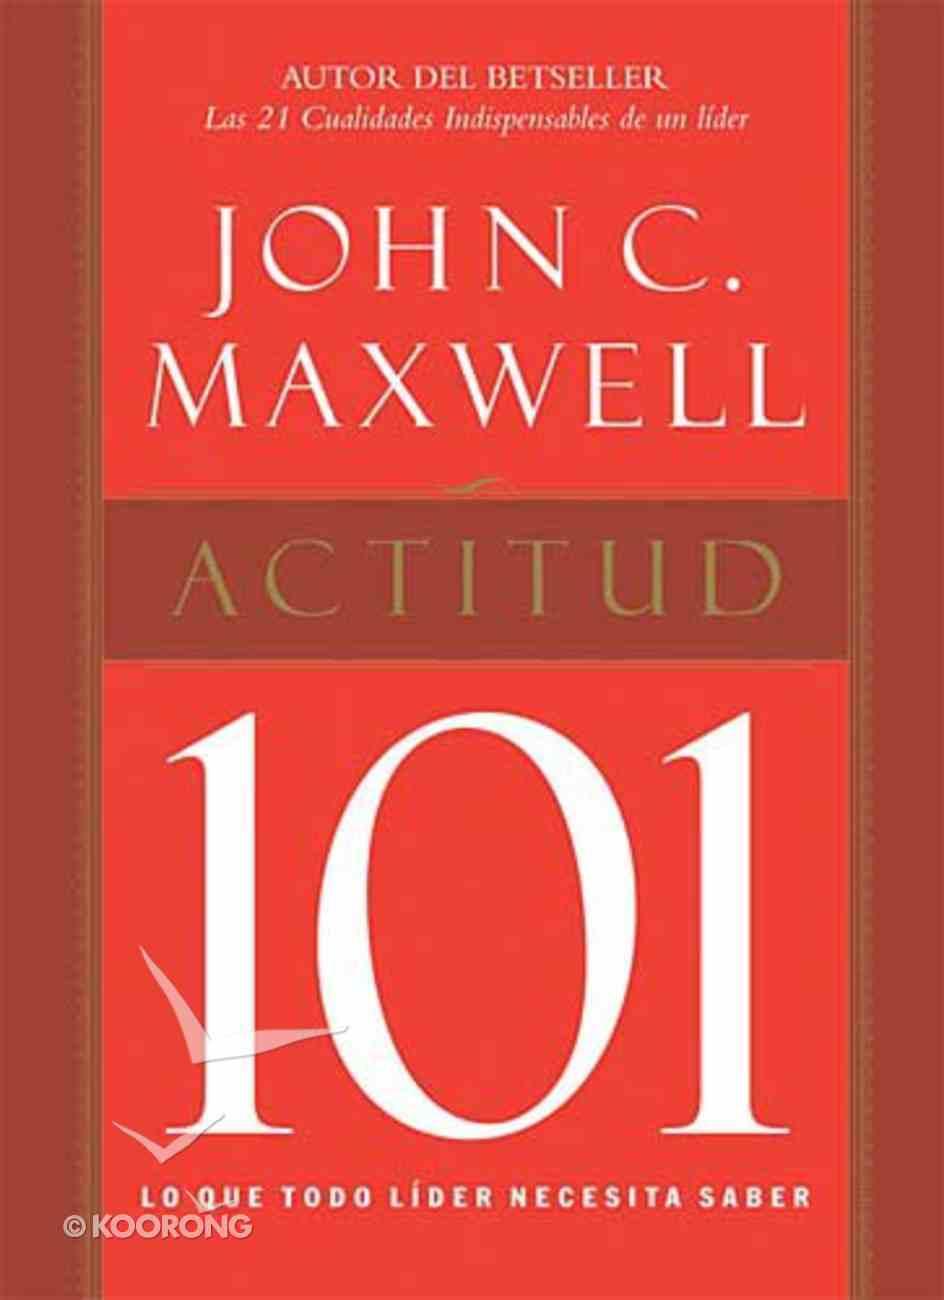 Actitud 101 (Attitude 101) Hardback